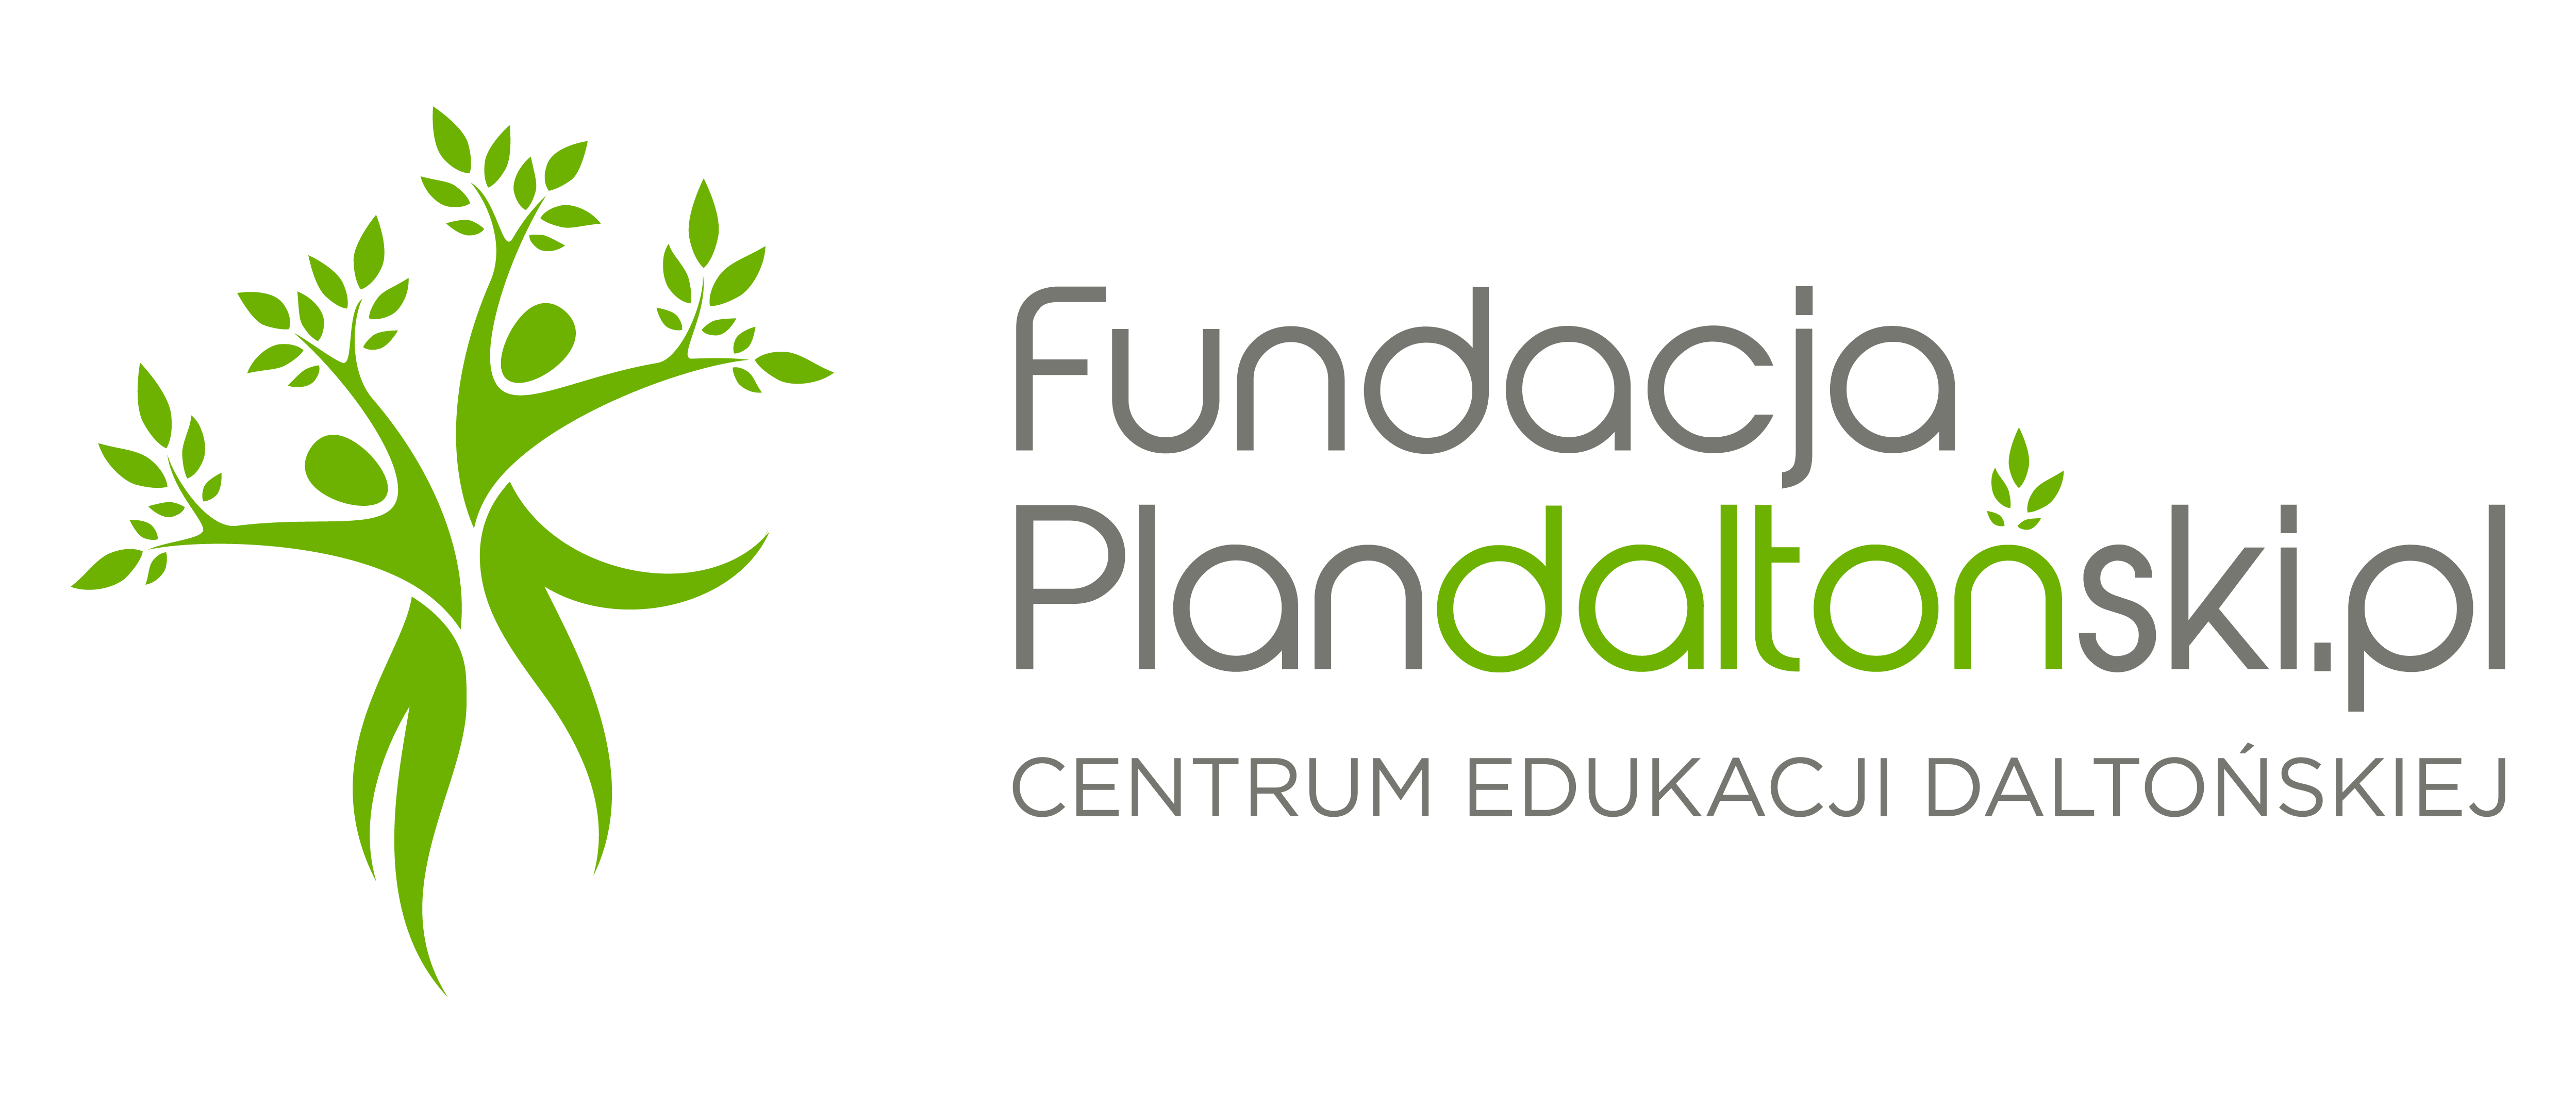 Fundacja Plandaltonski.pl